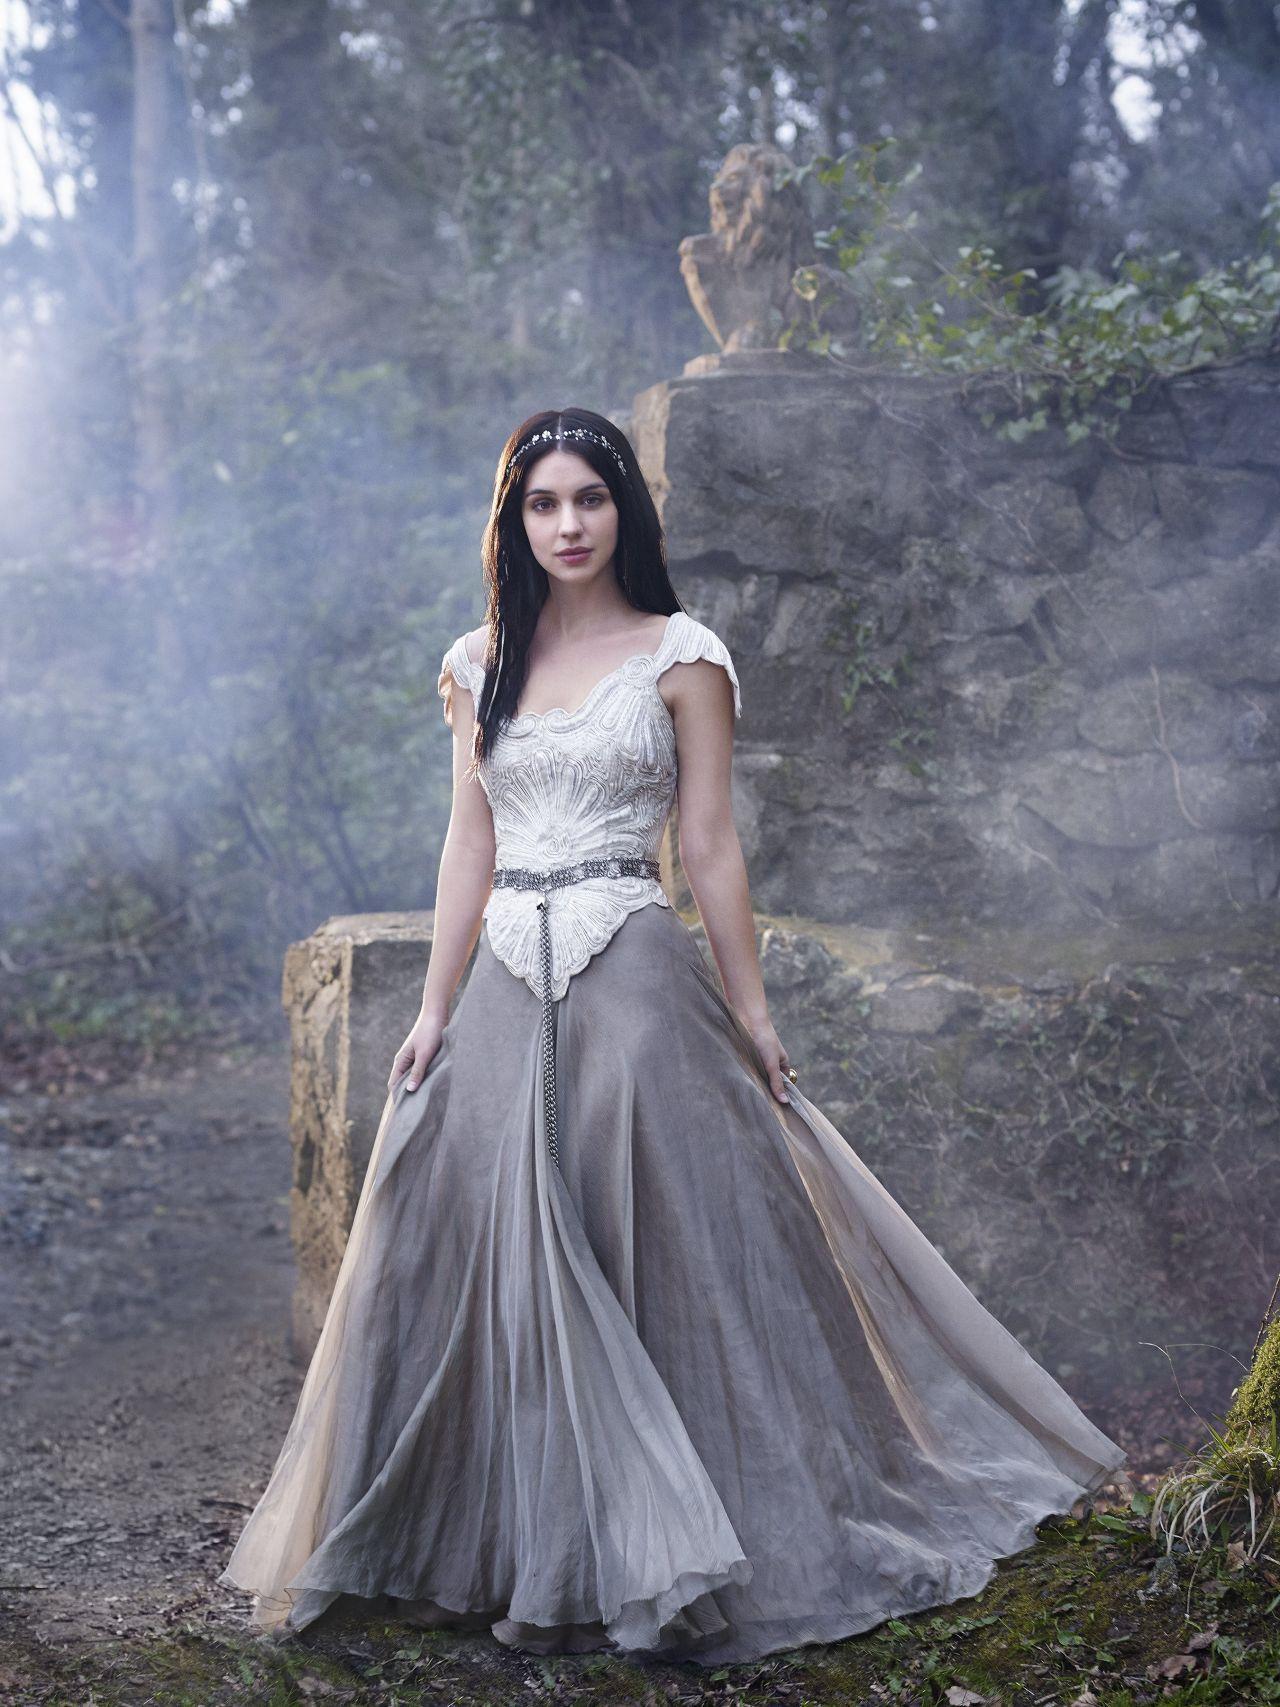 Adelaide kane reign tv series promoshoot for Reign mary wedding dress